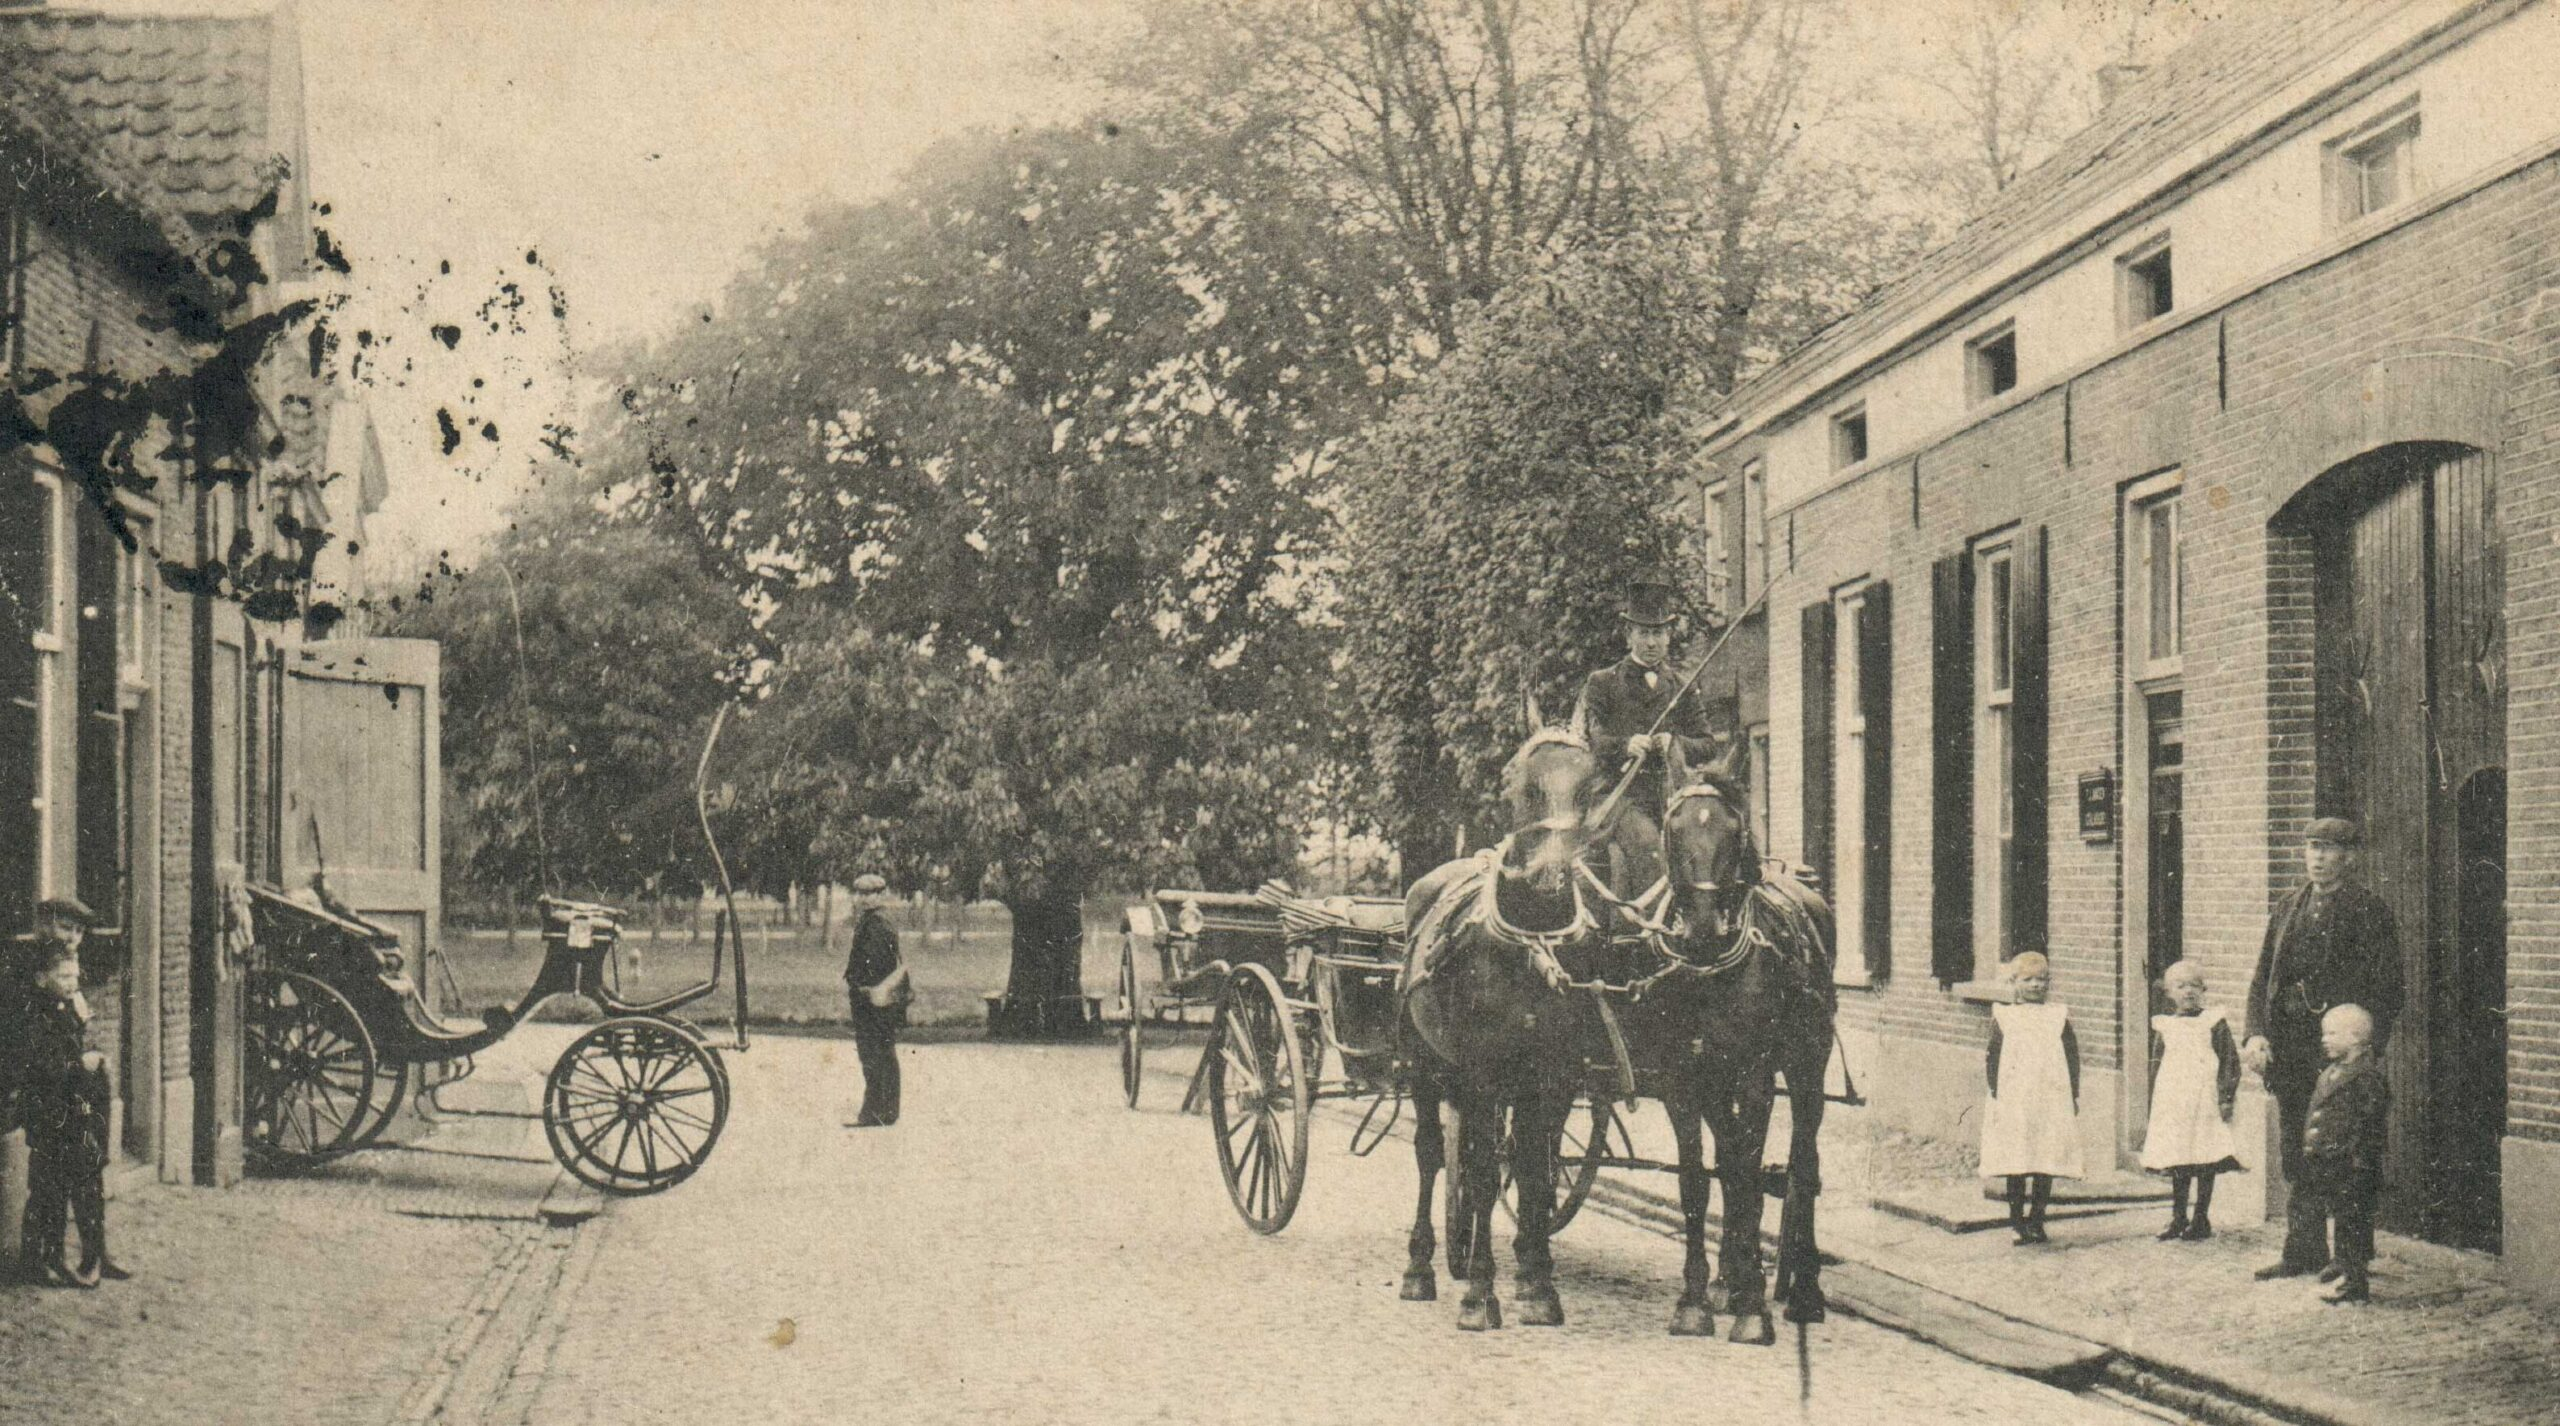 Laag-Keppel Dorpsstraat 7 Dwarshuis voorheen boerderij